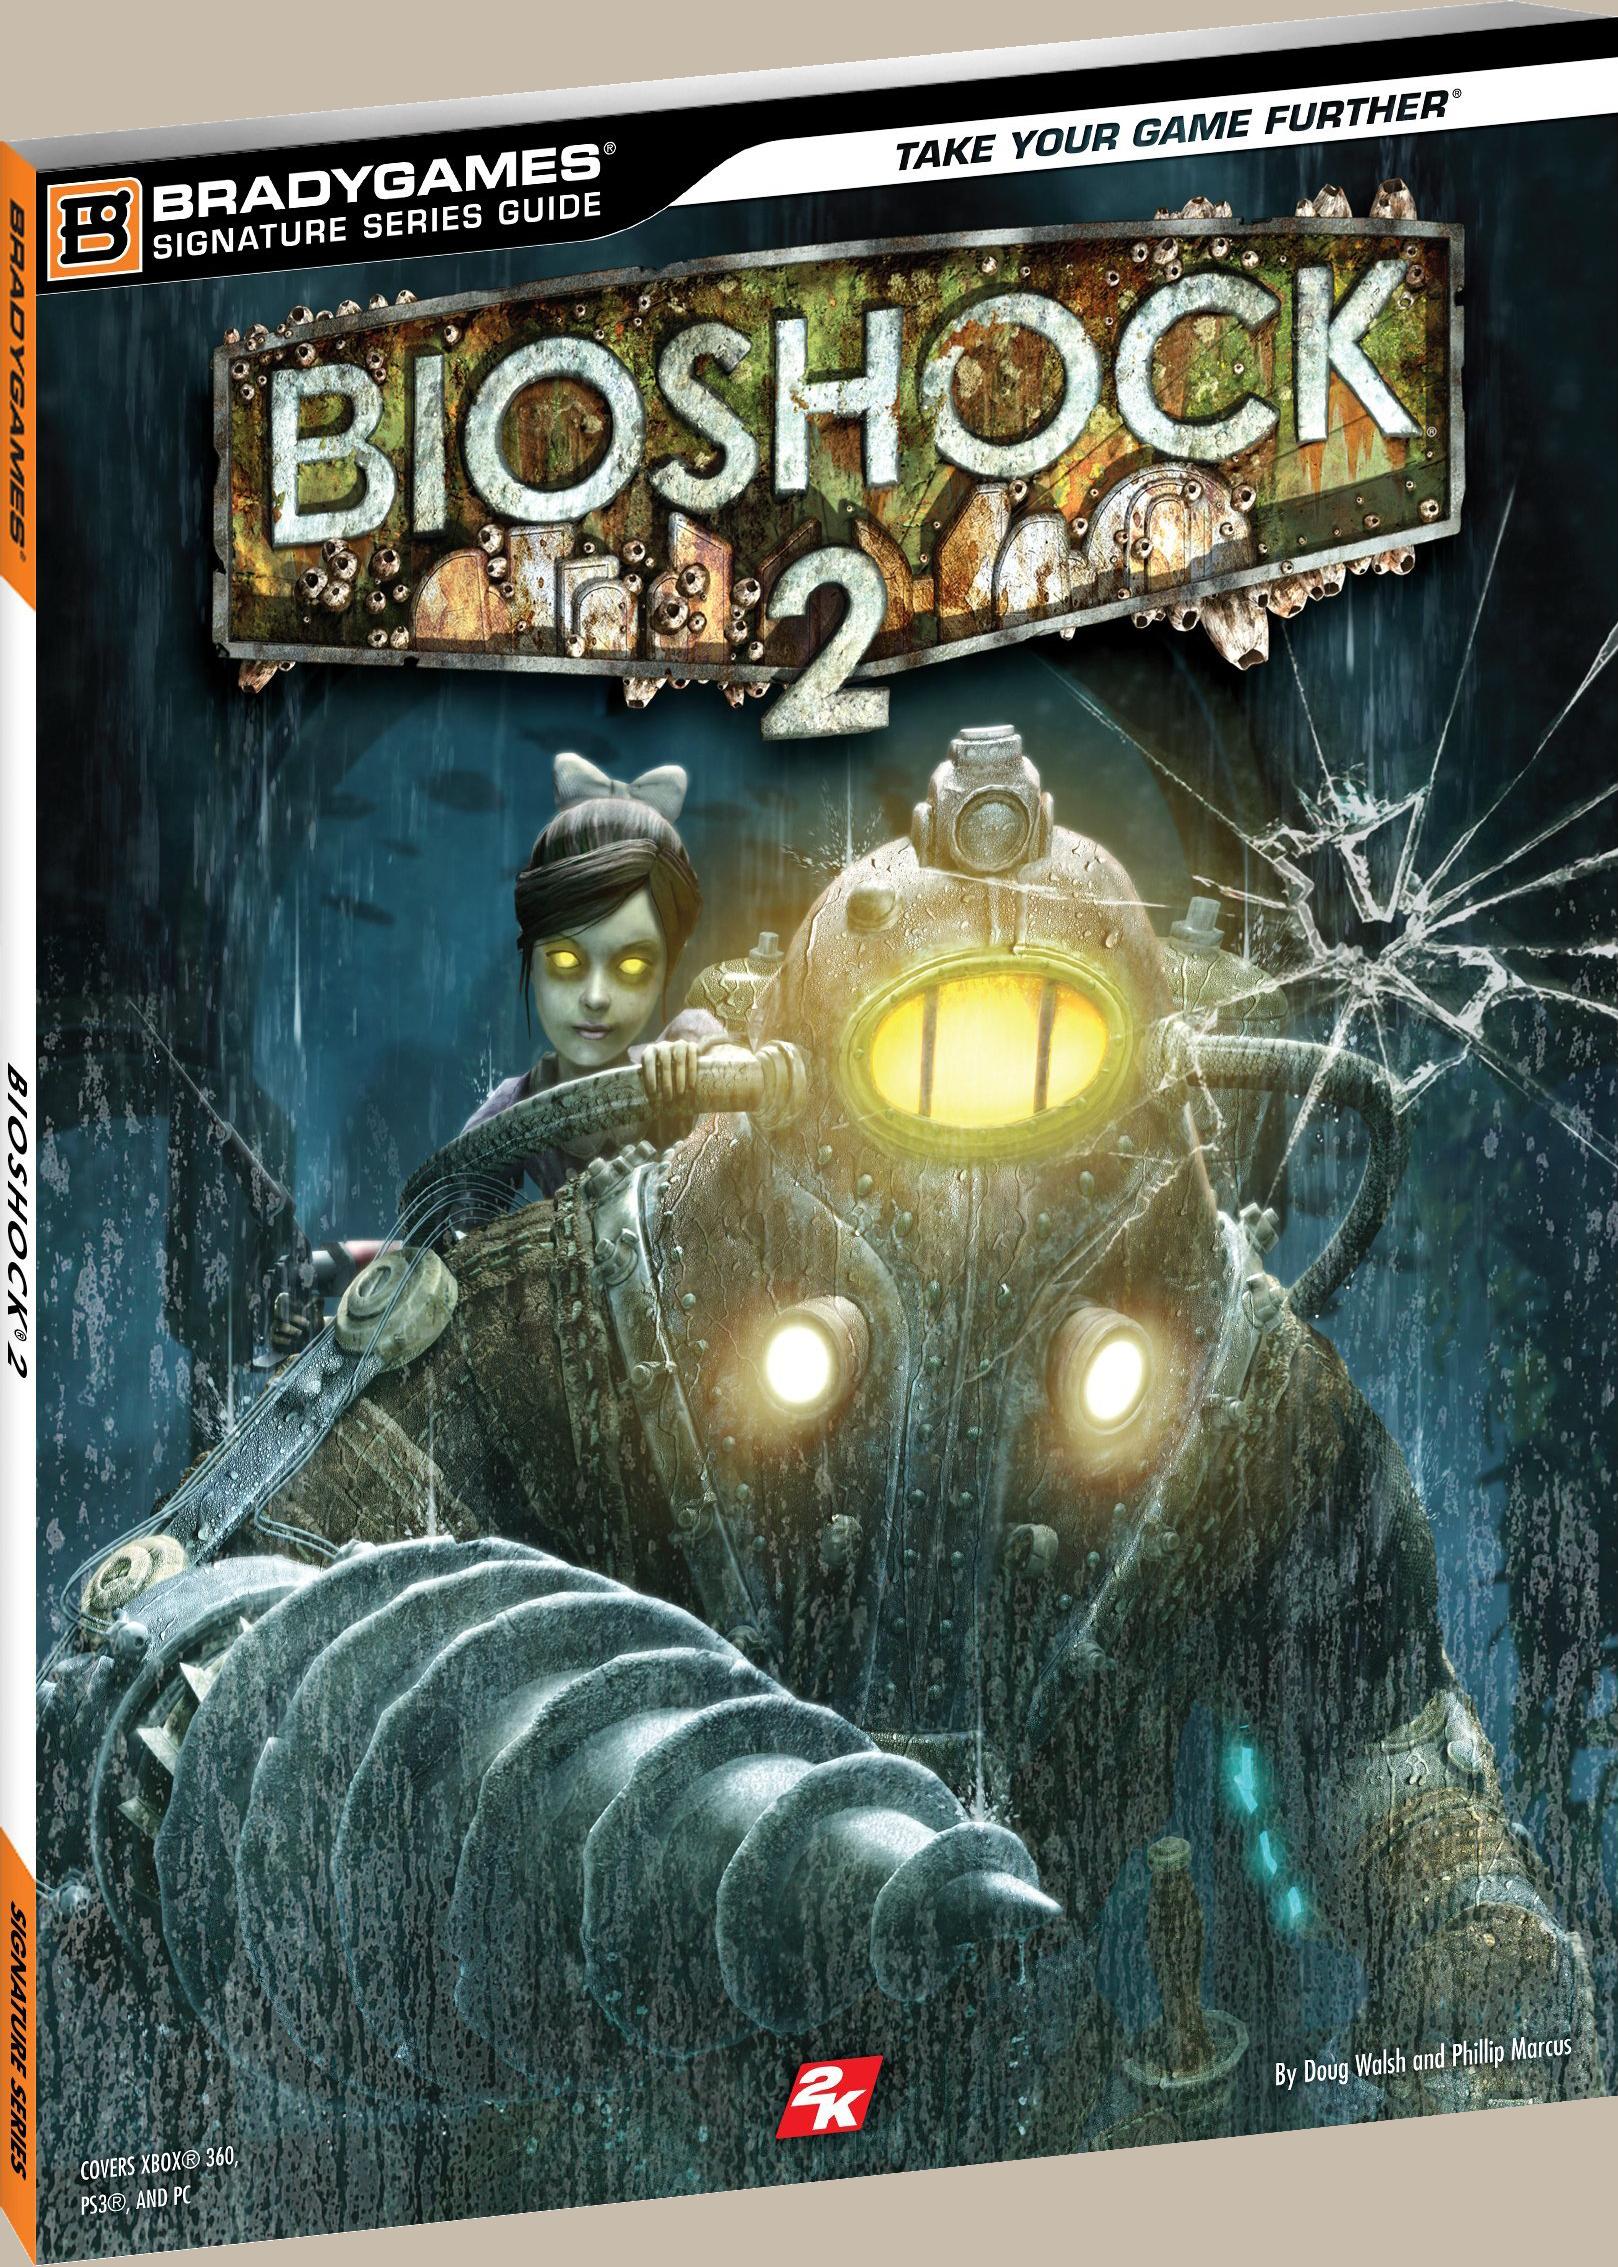 Bioshock 2 signature series guide bioshock wiki fandom - Bioshock wikia ...